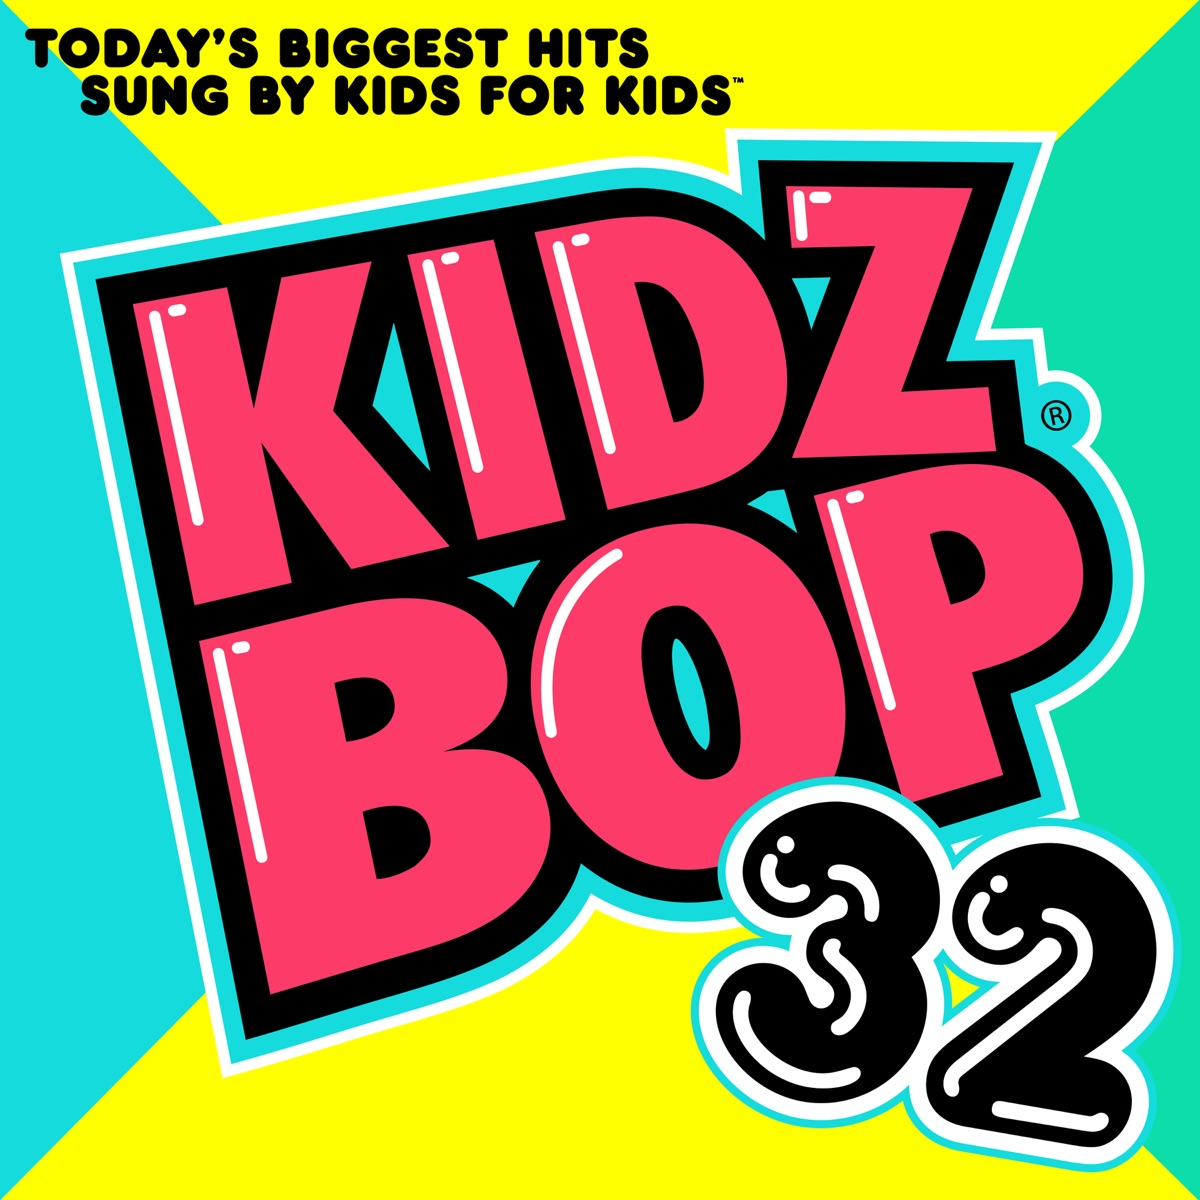 Kidz Bop 32 Album Cover by KIDZ BOP Kids